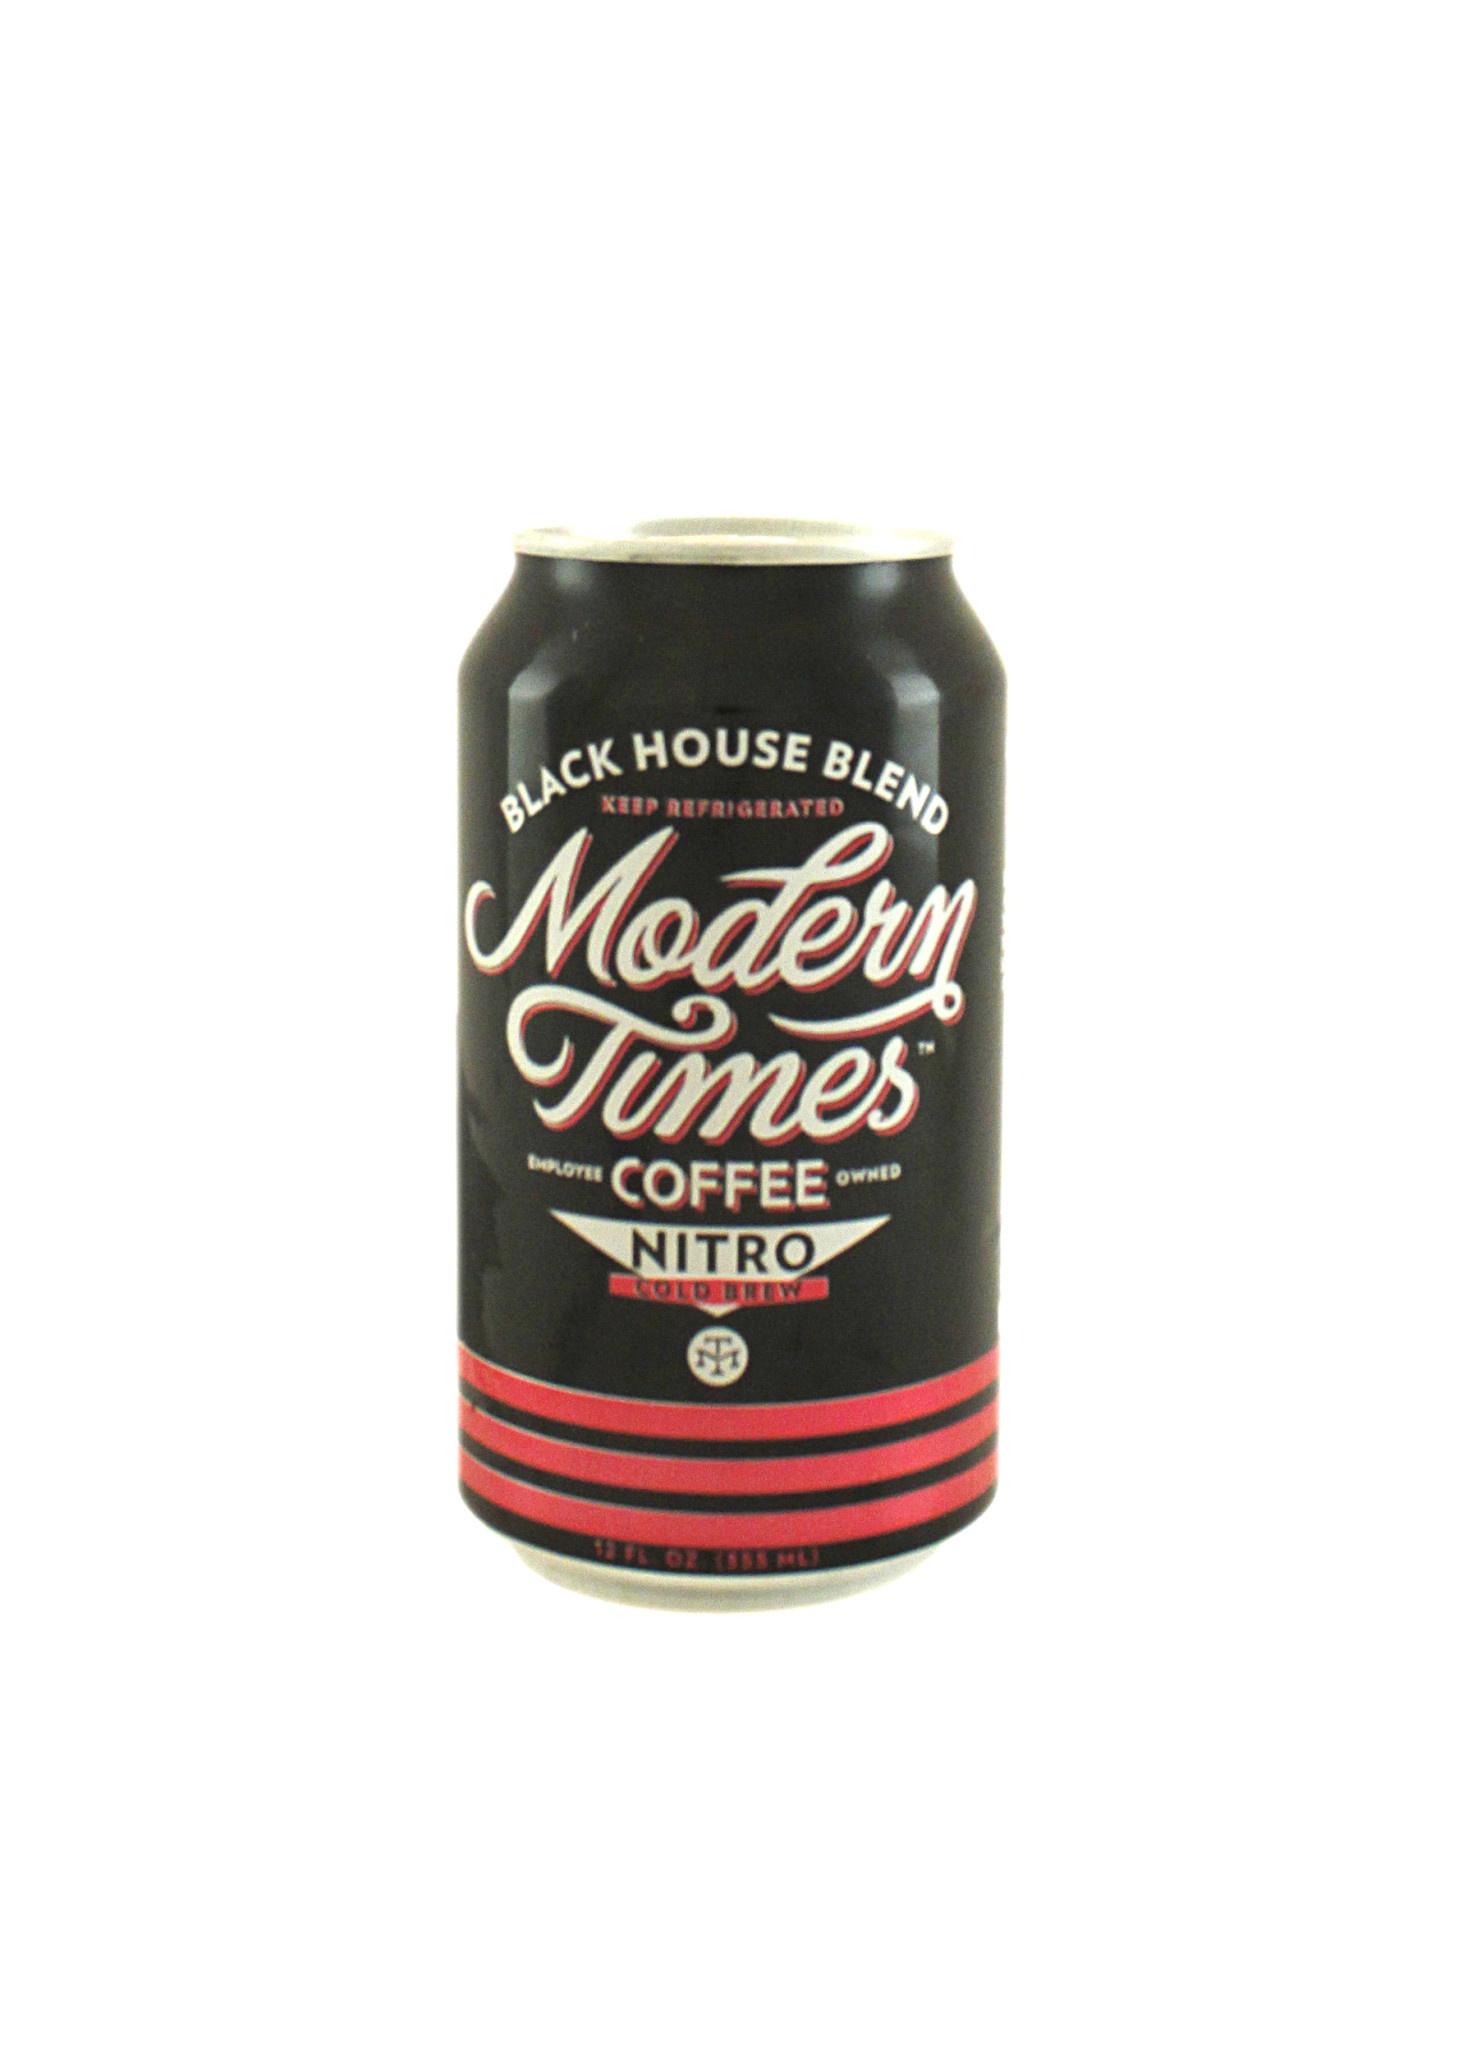 "Modern Times Coffee ""Nitro"" Cold Brew Coffee w/Blueberries & Chocolate 12oz. Can - San Diego, CA"